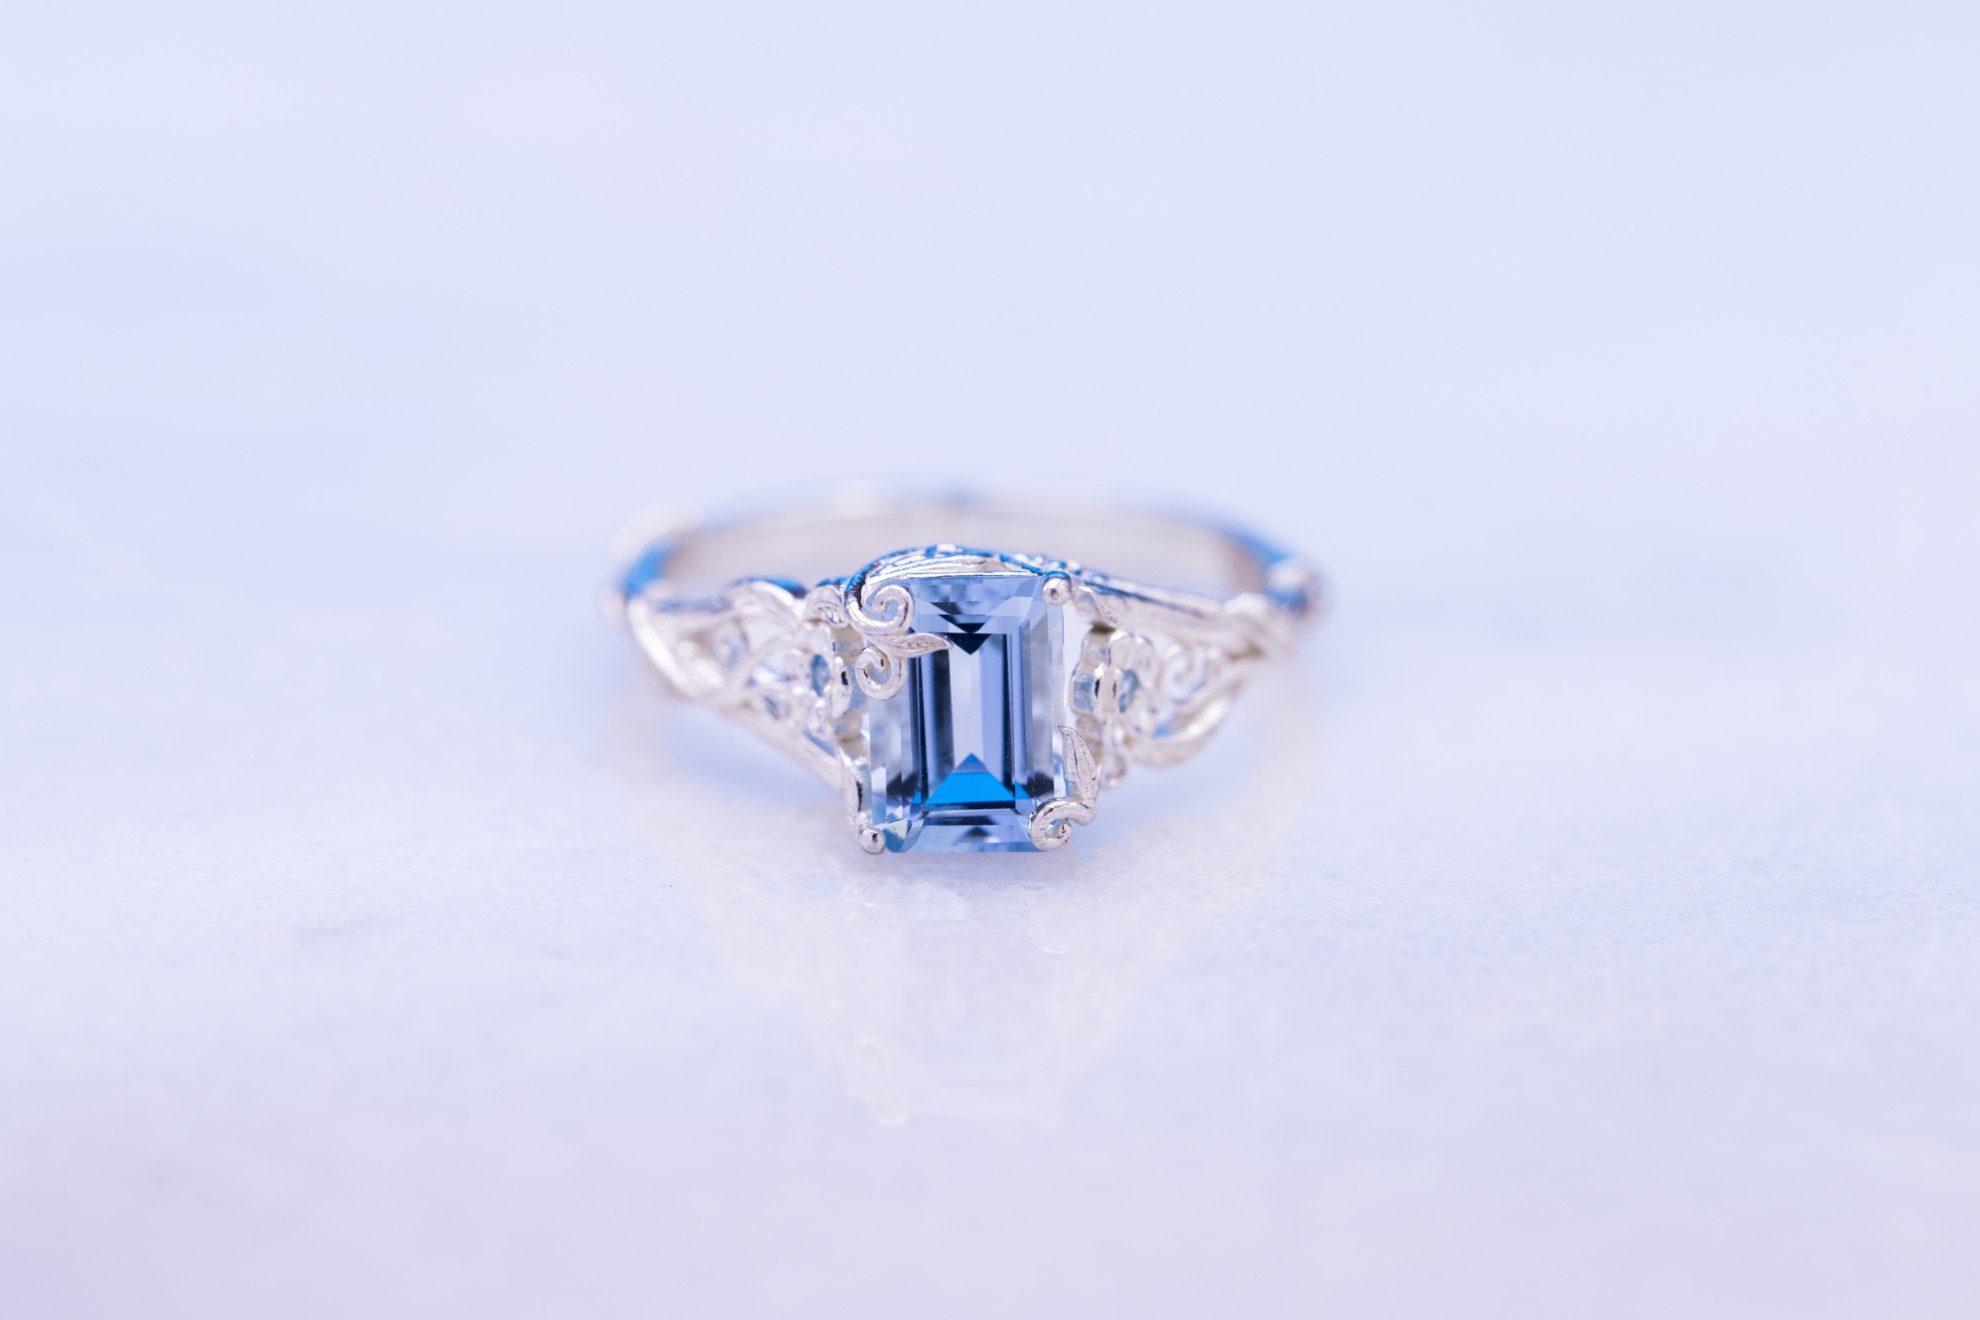 aquamarine and vines - engagement ring setting